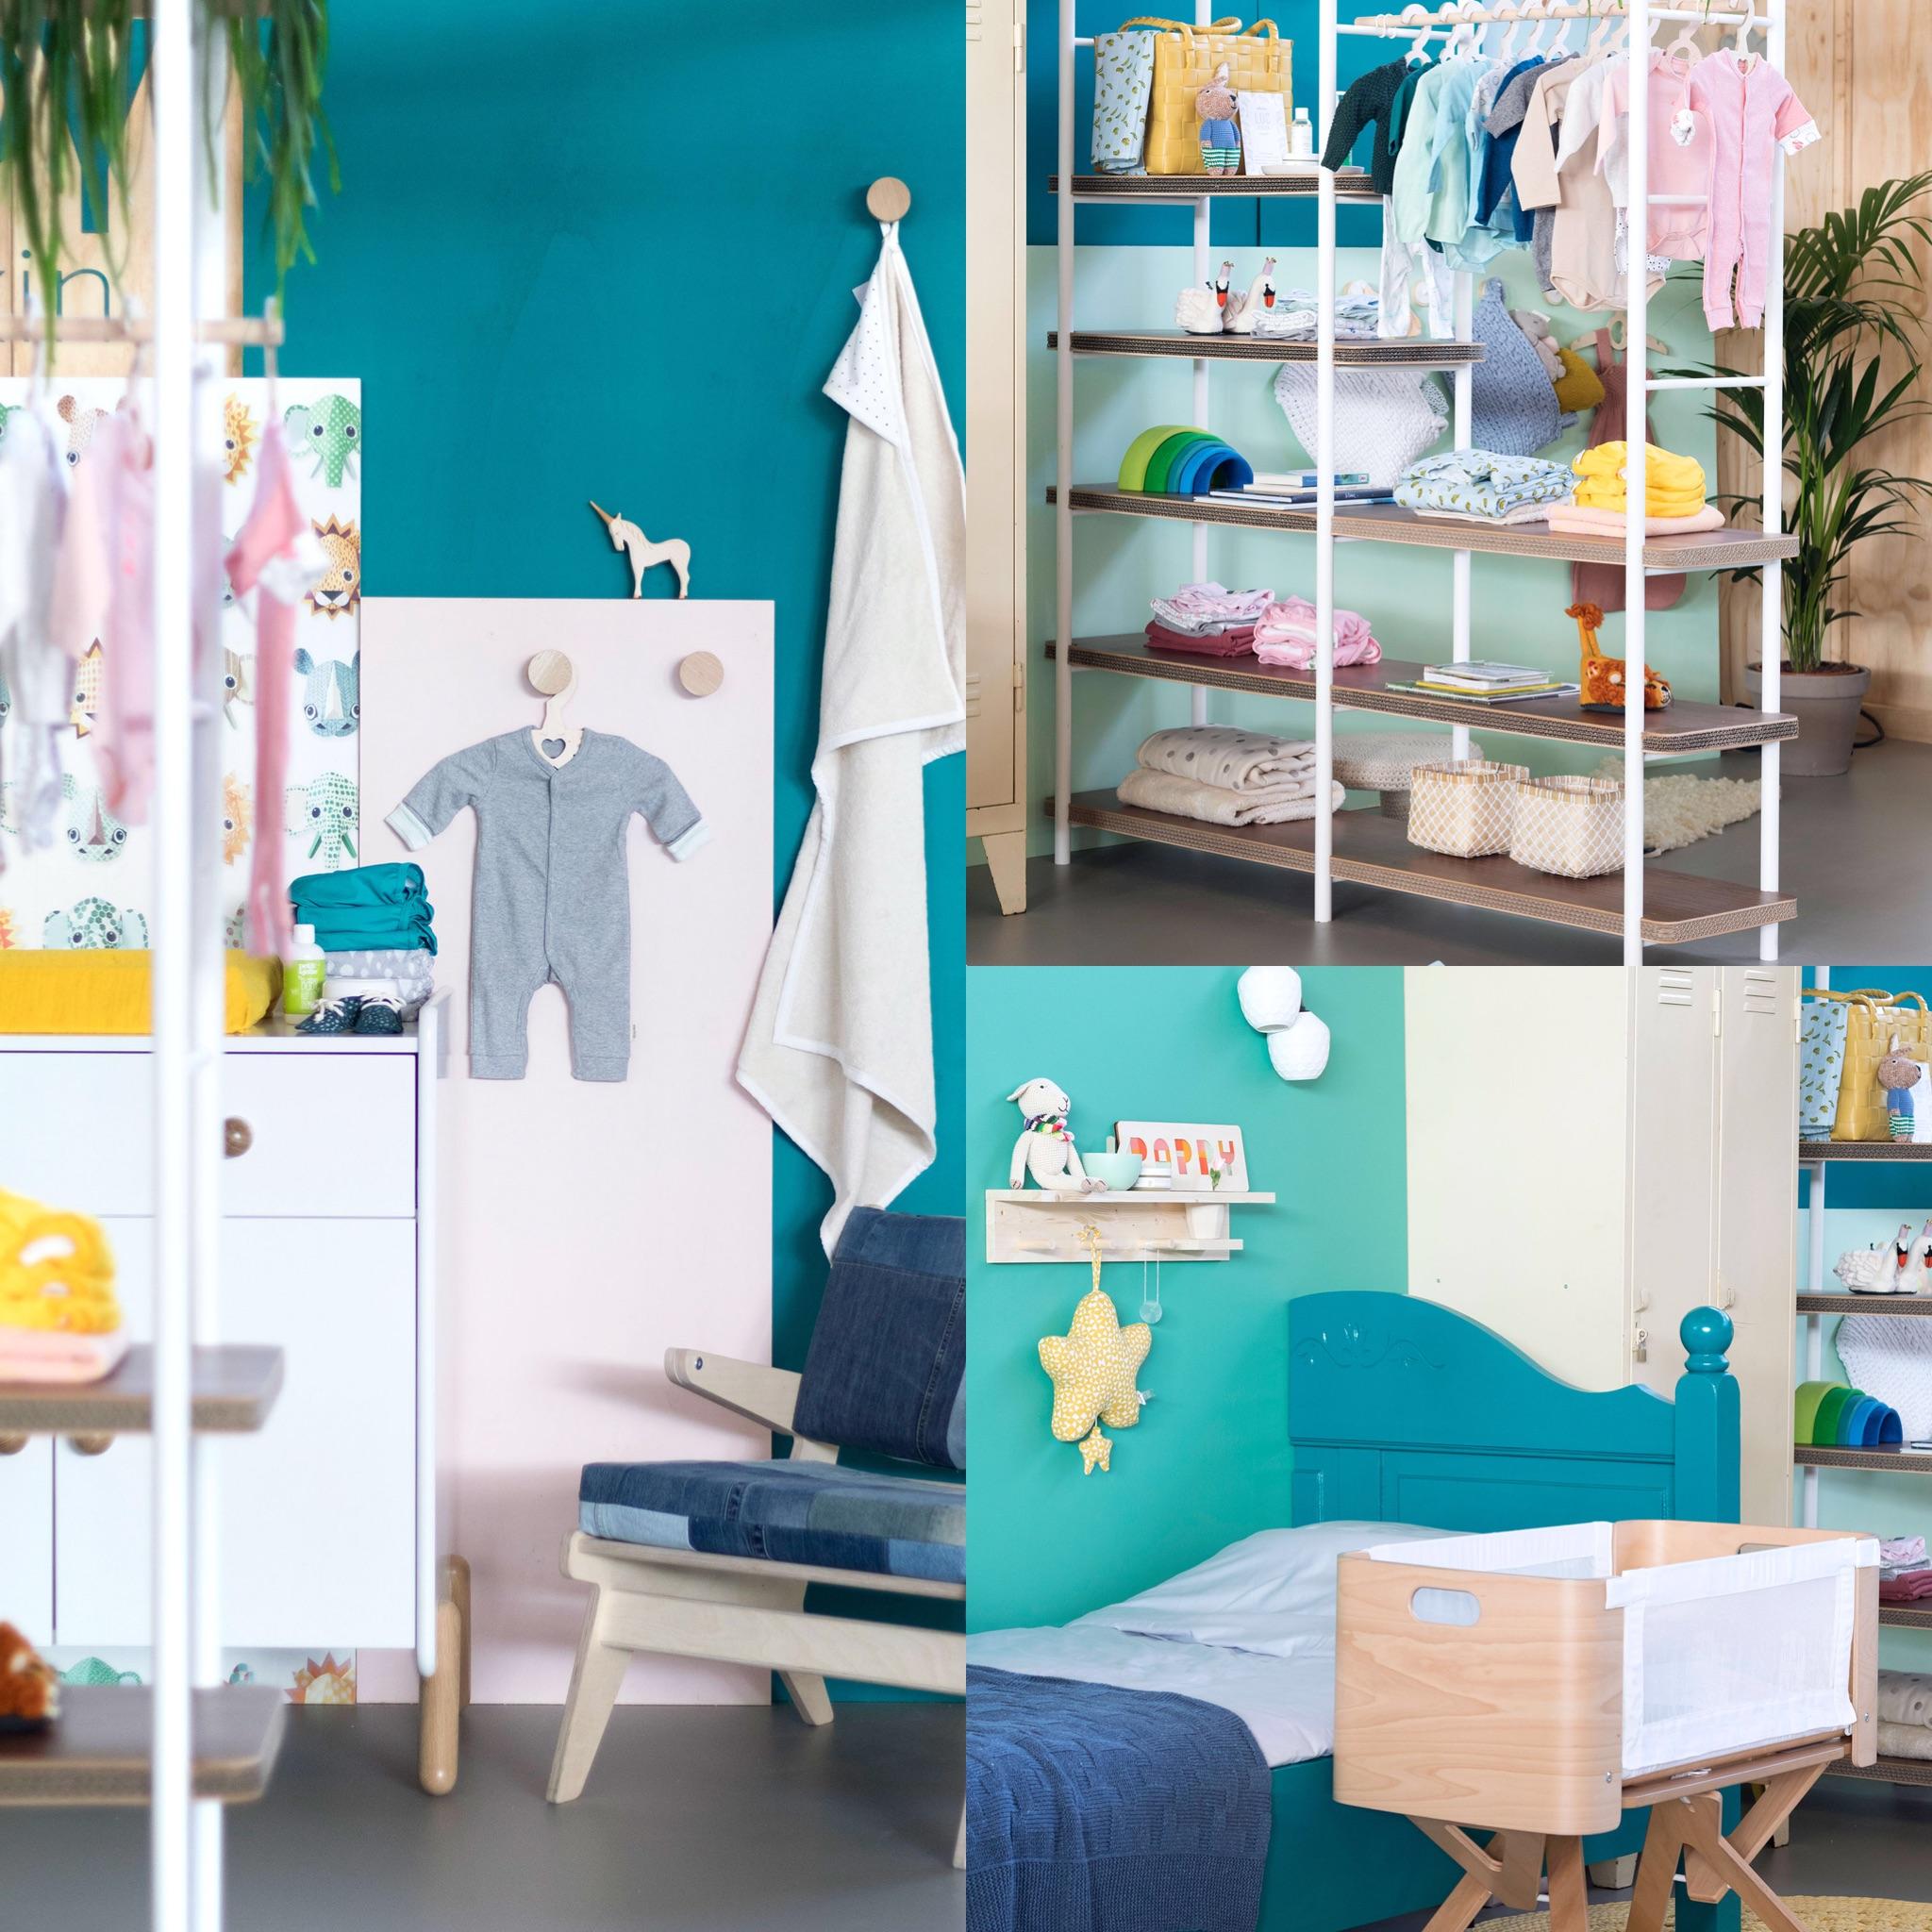 Duurzame Kinderkamer Stylist-Poppy to Pumpkin duurzame babykamer 2018